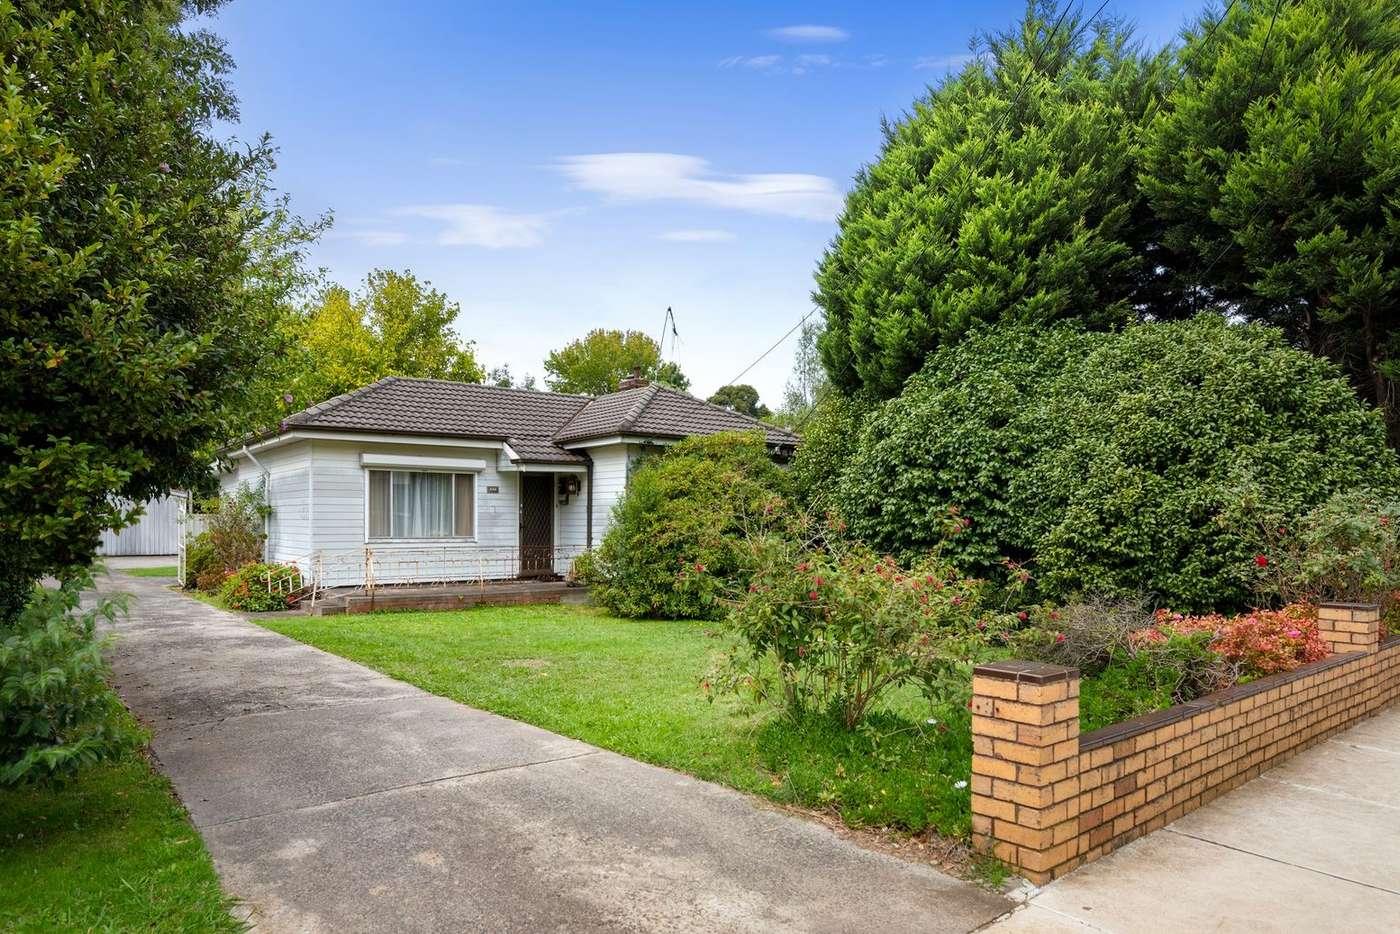 Main view of Homely house listing, 449 Mount Dandenong Road, Kilsyth VIC 3137